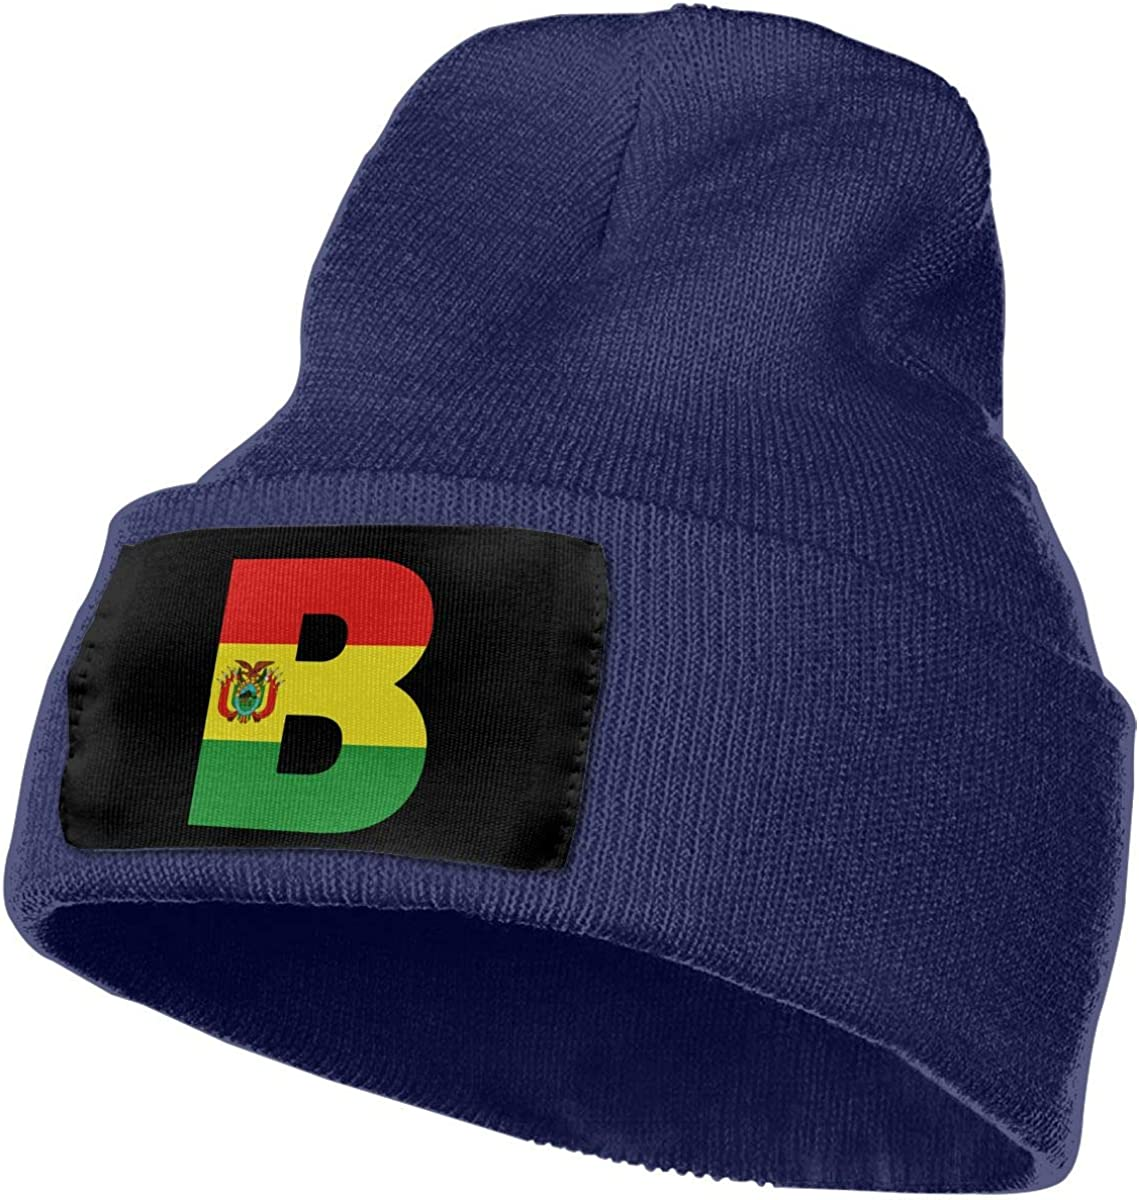 Bolivia Flag B Letter Unisex Fashion Knitted Hat Luxury Hip-Hop Cap